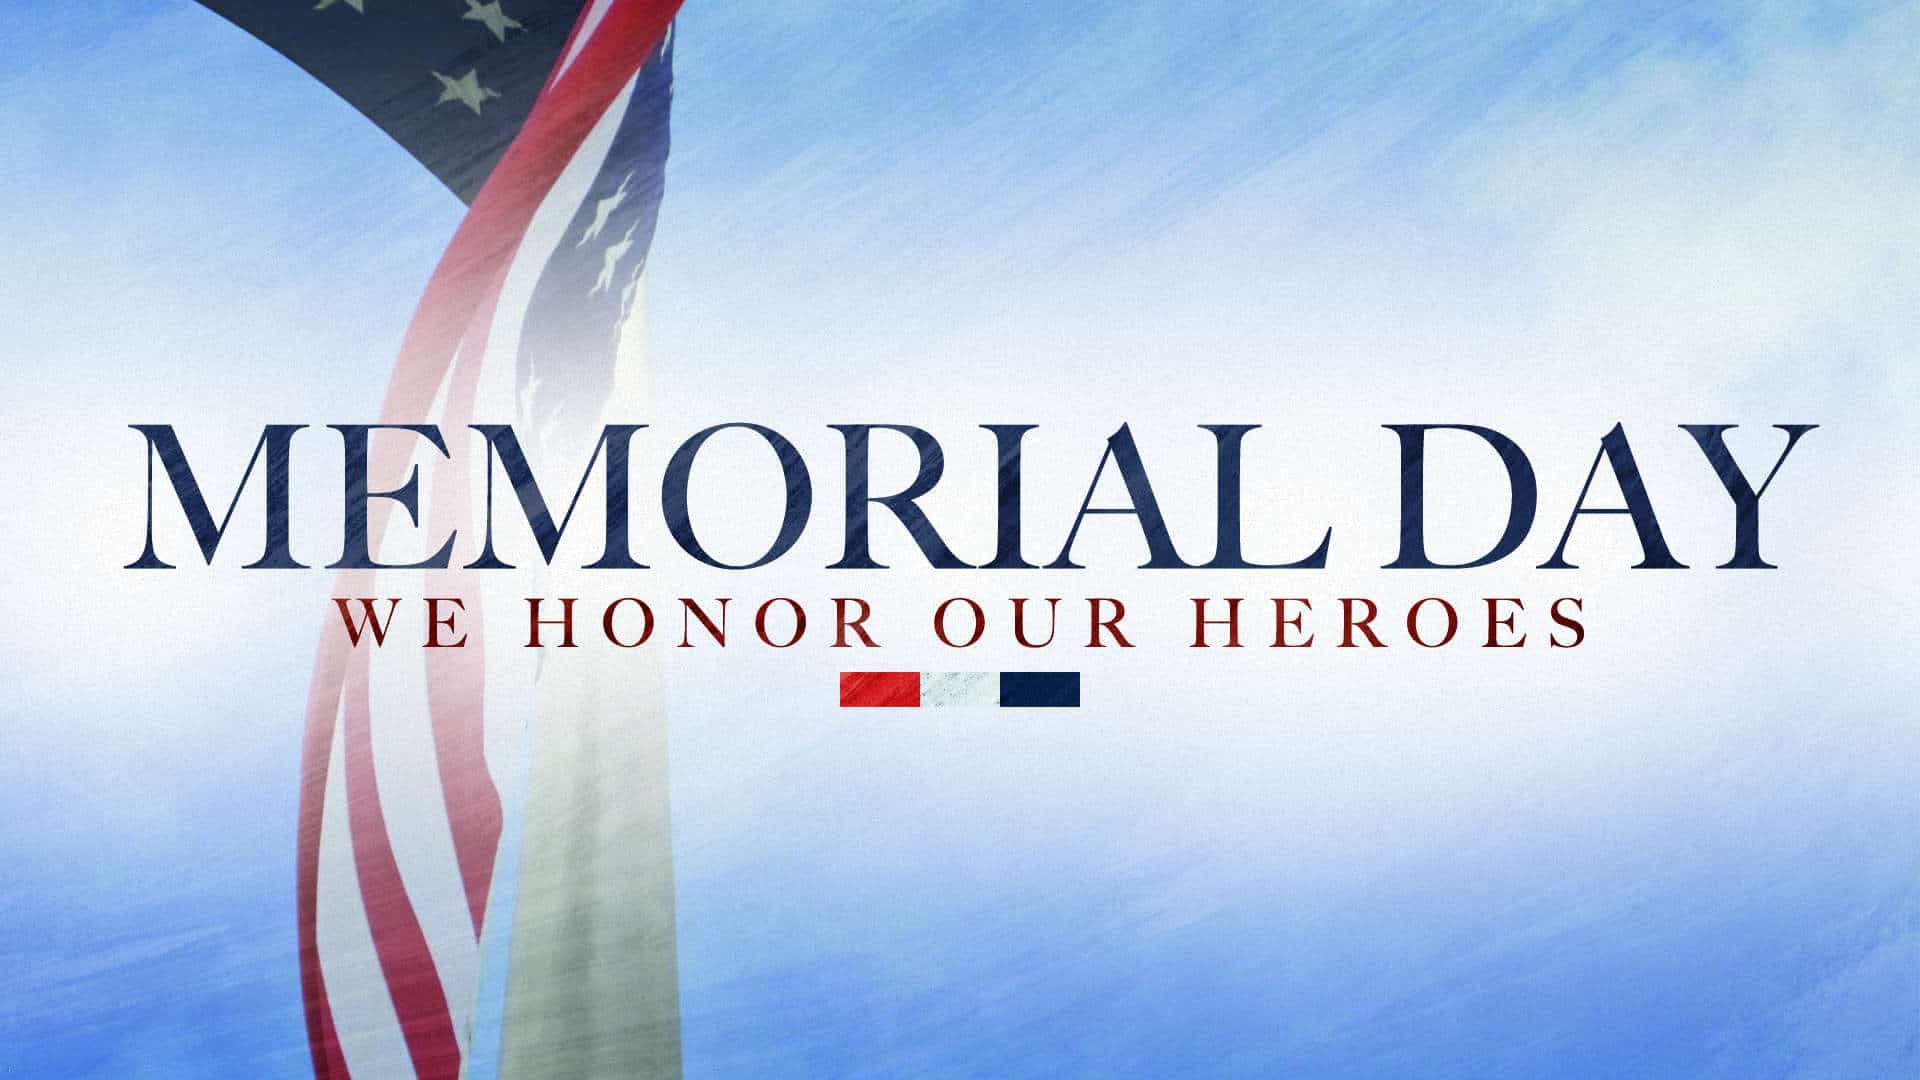 memorial day - photo #36